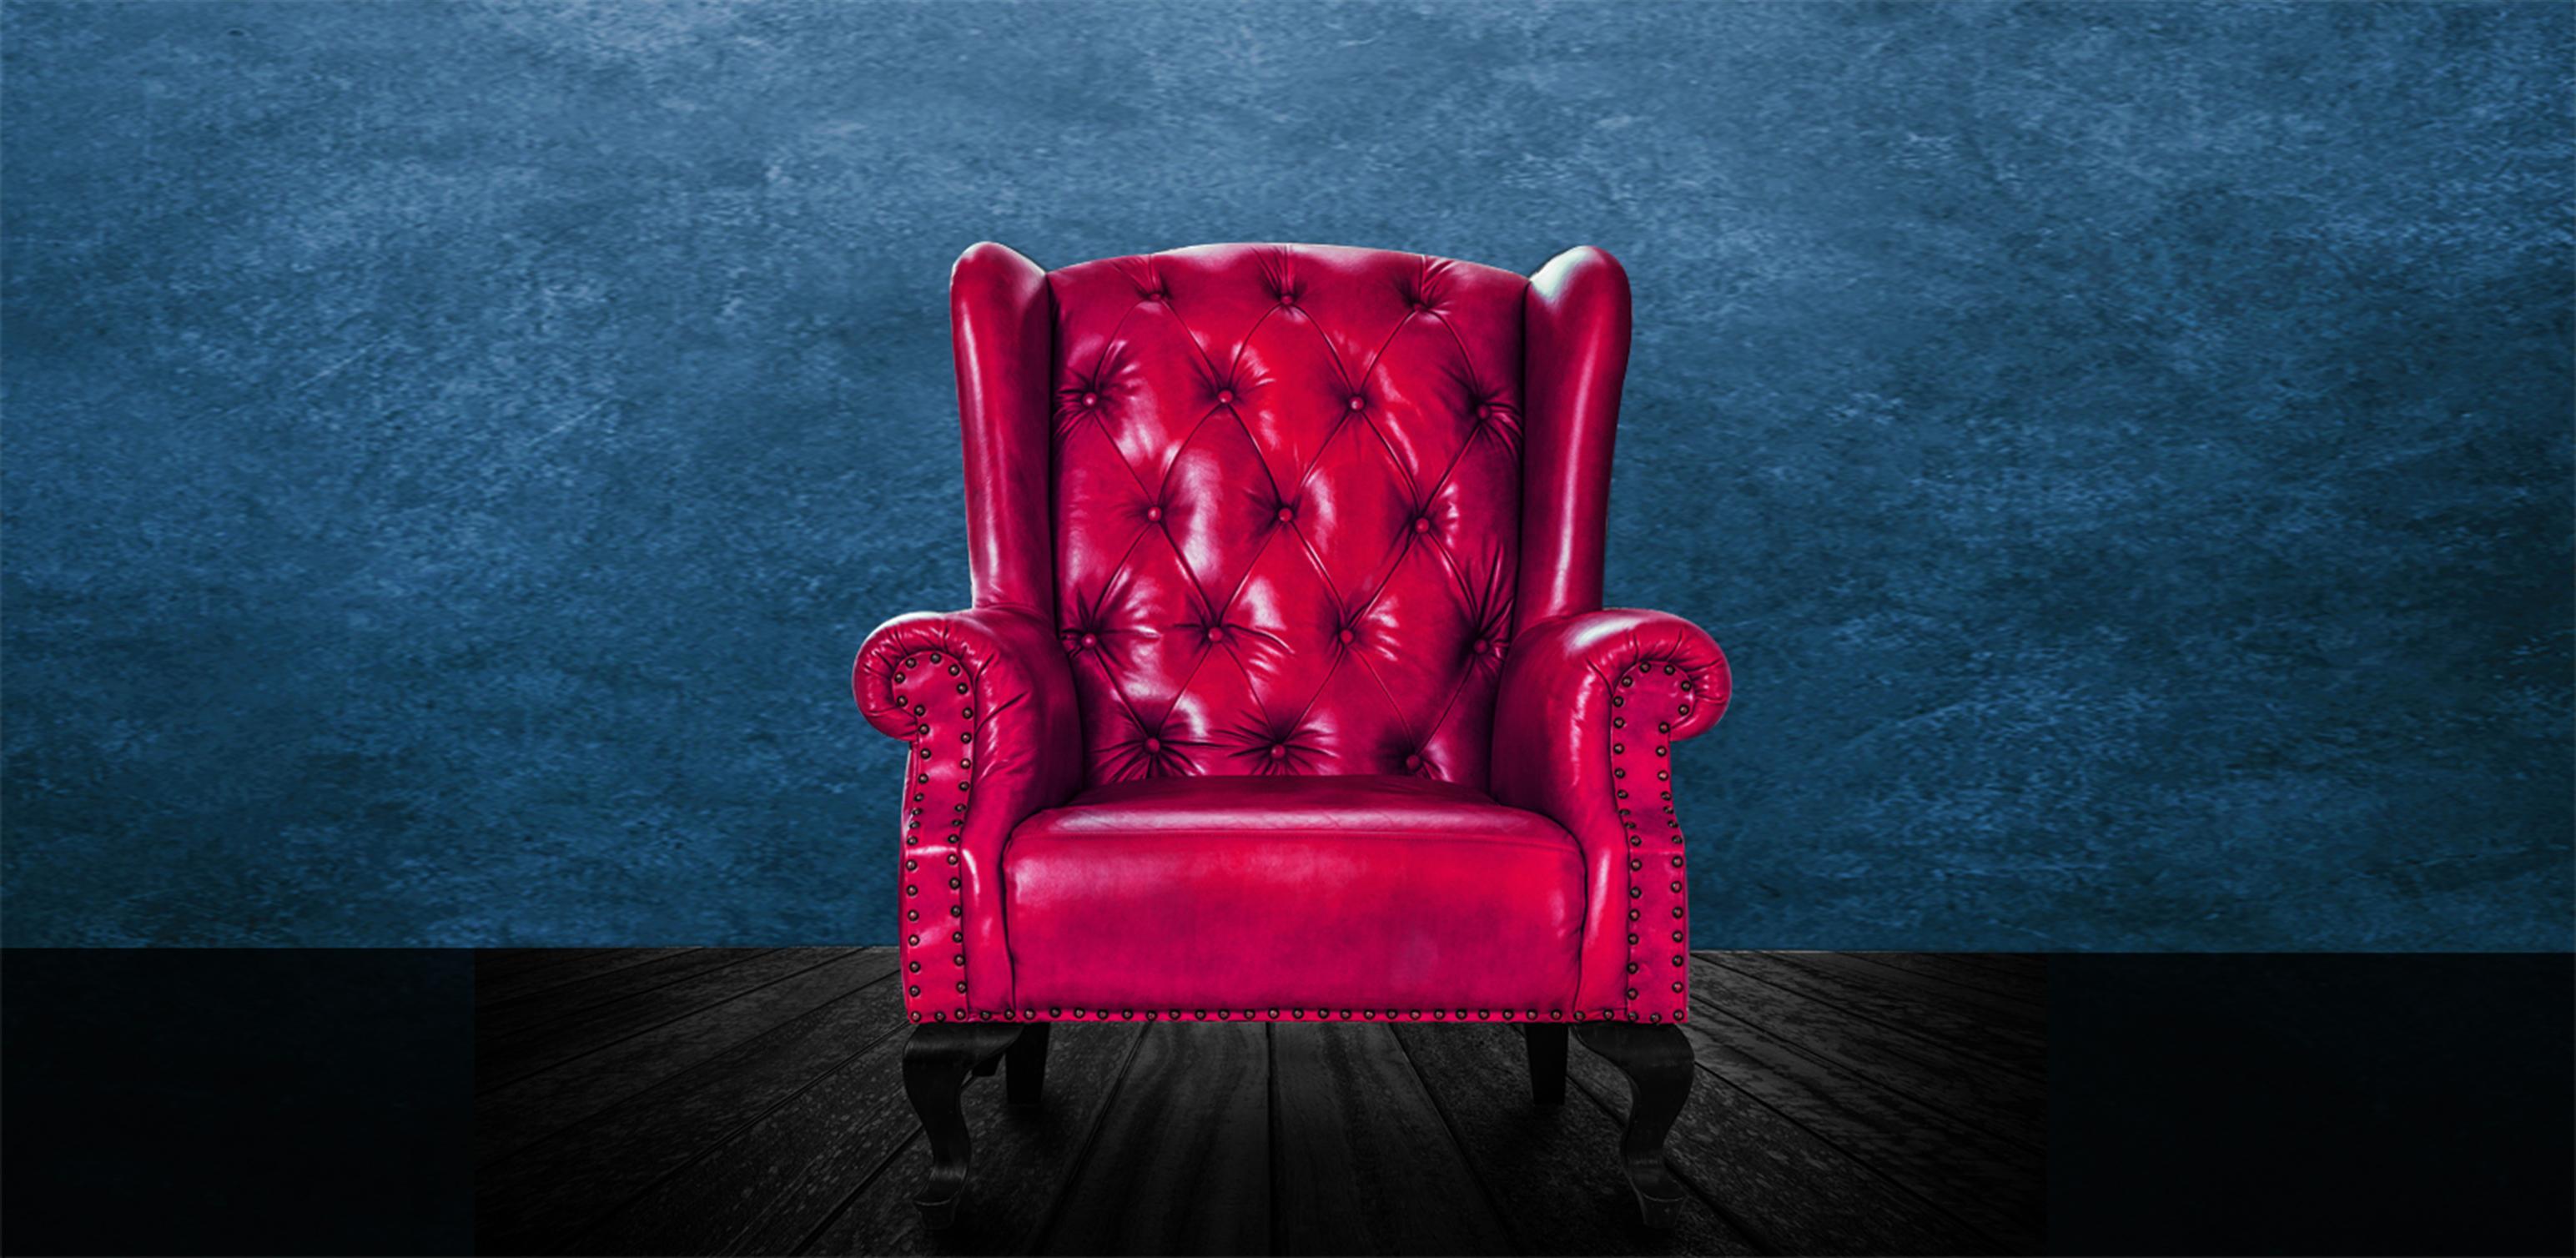 ULIP : Best ULIP Investment & Insurance Plans | Canara HSBC OBC Life